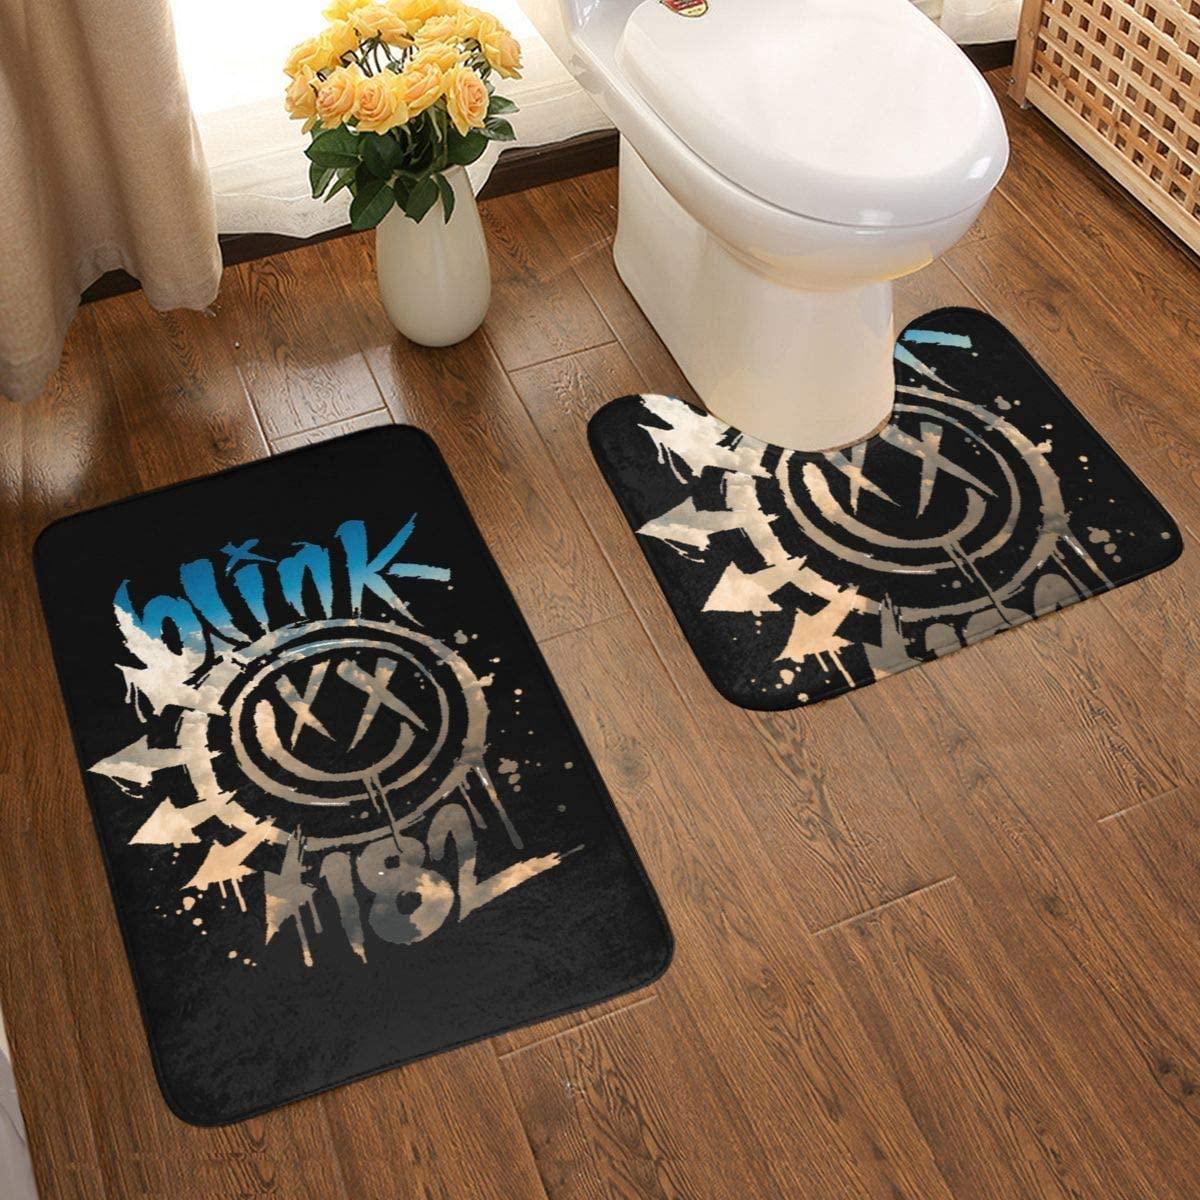 Music Blink-182 Bathroom Rug Mats Set 2 Piece Anti-Skid Pads Bath Mat + Contour Bathroom Antiskid Pad One Size